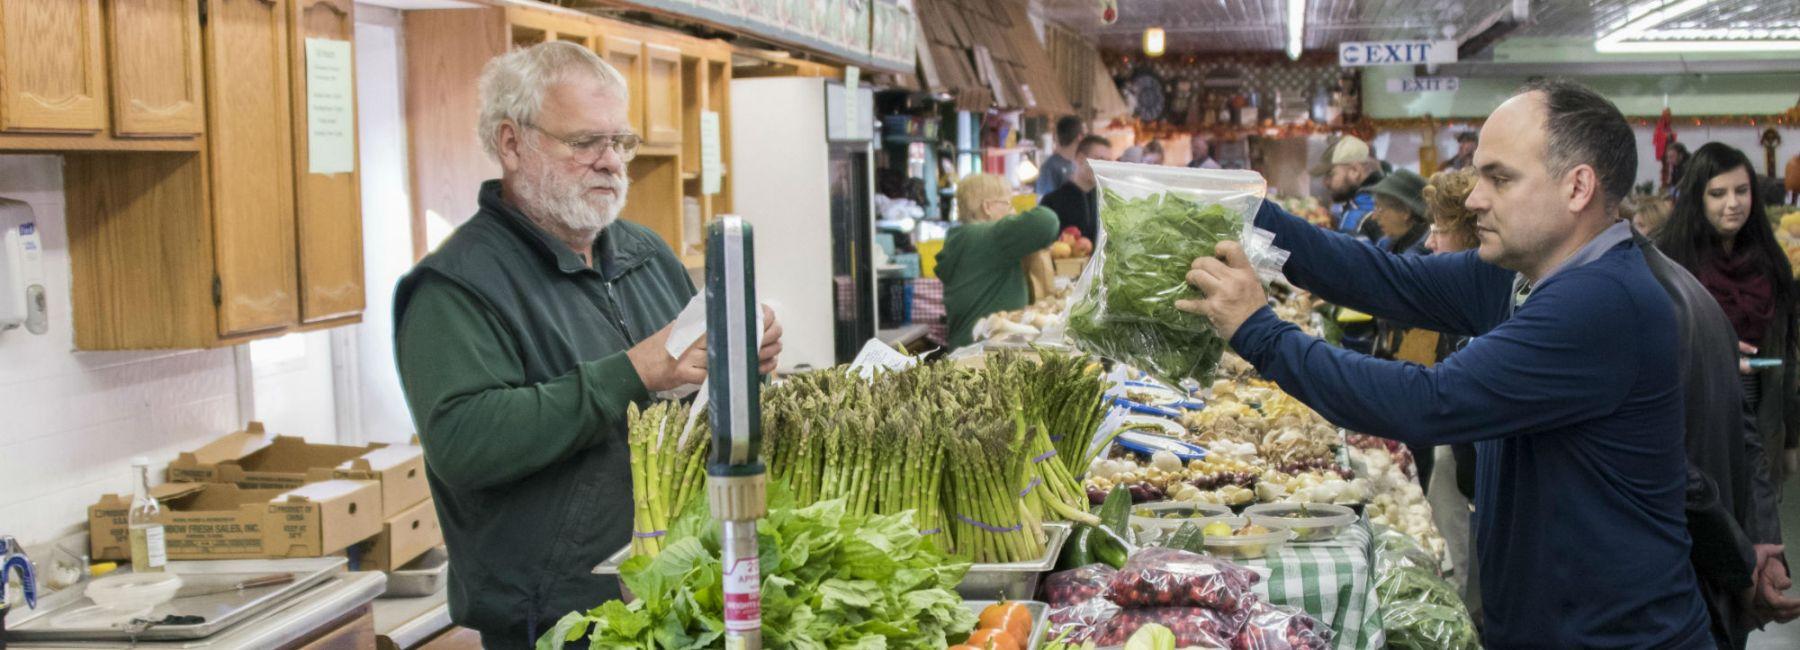 St Joseph Farmers Market